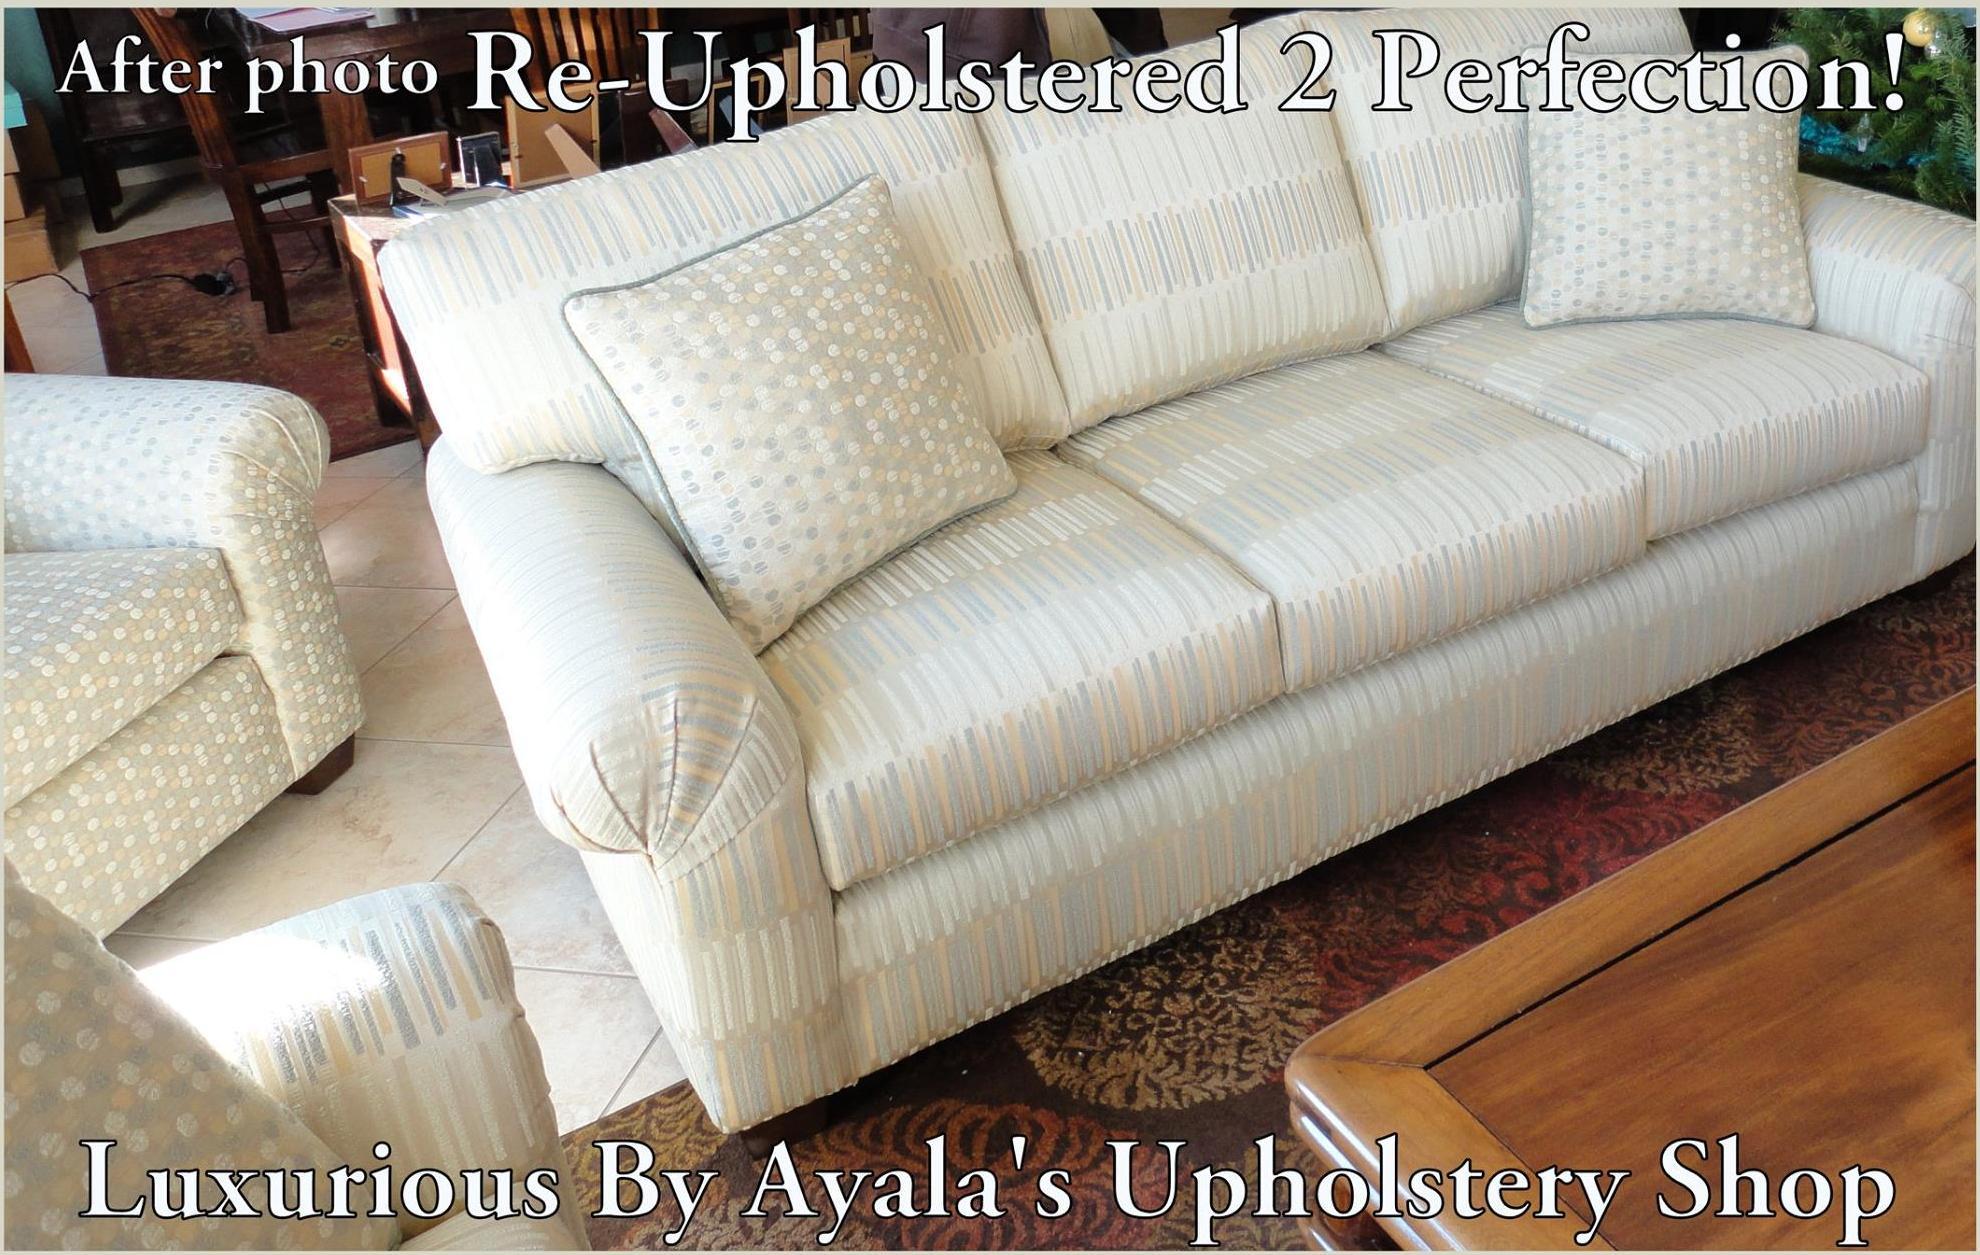 Custom Furniture By Anthony Ayala Upholstery Shop.jpg